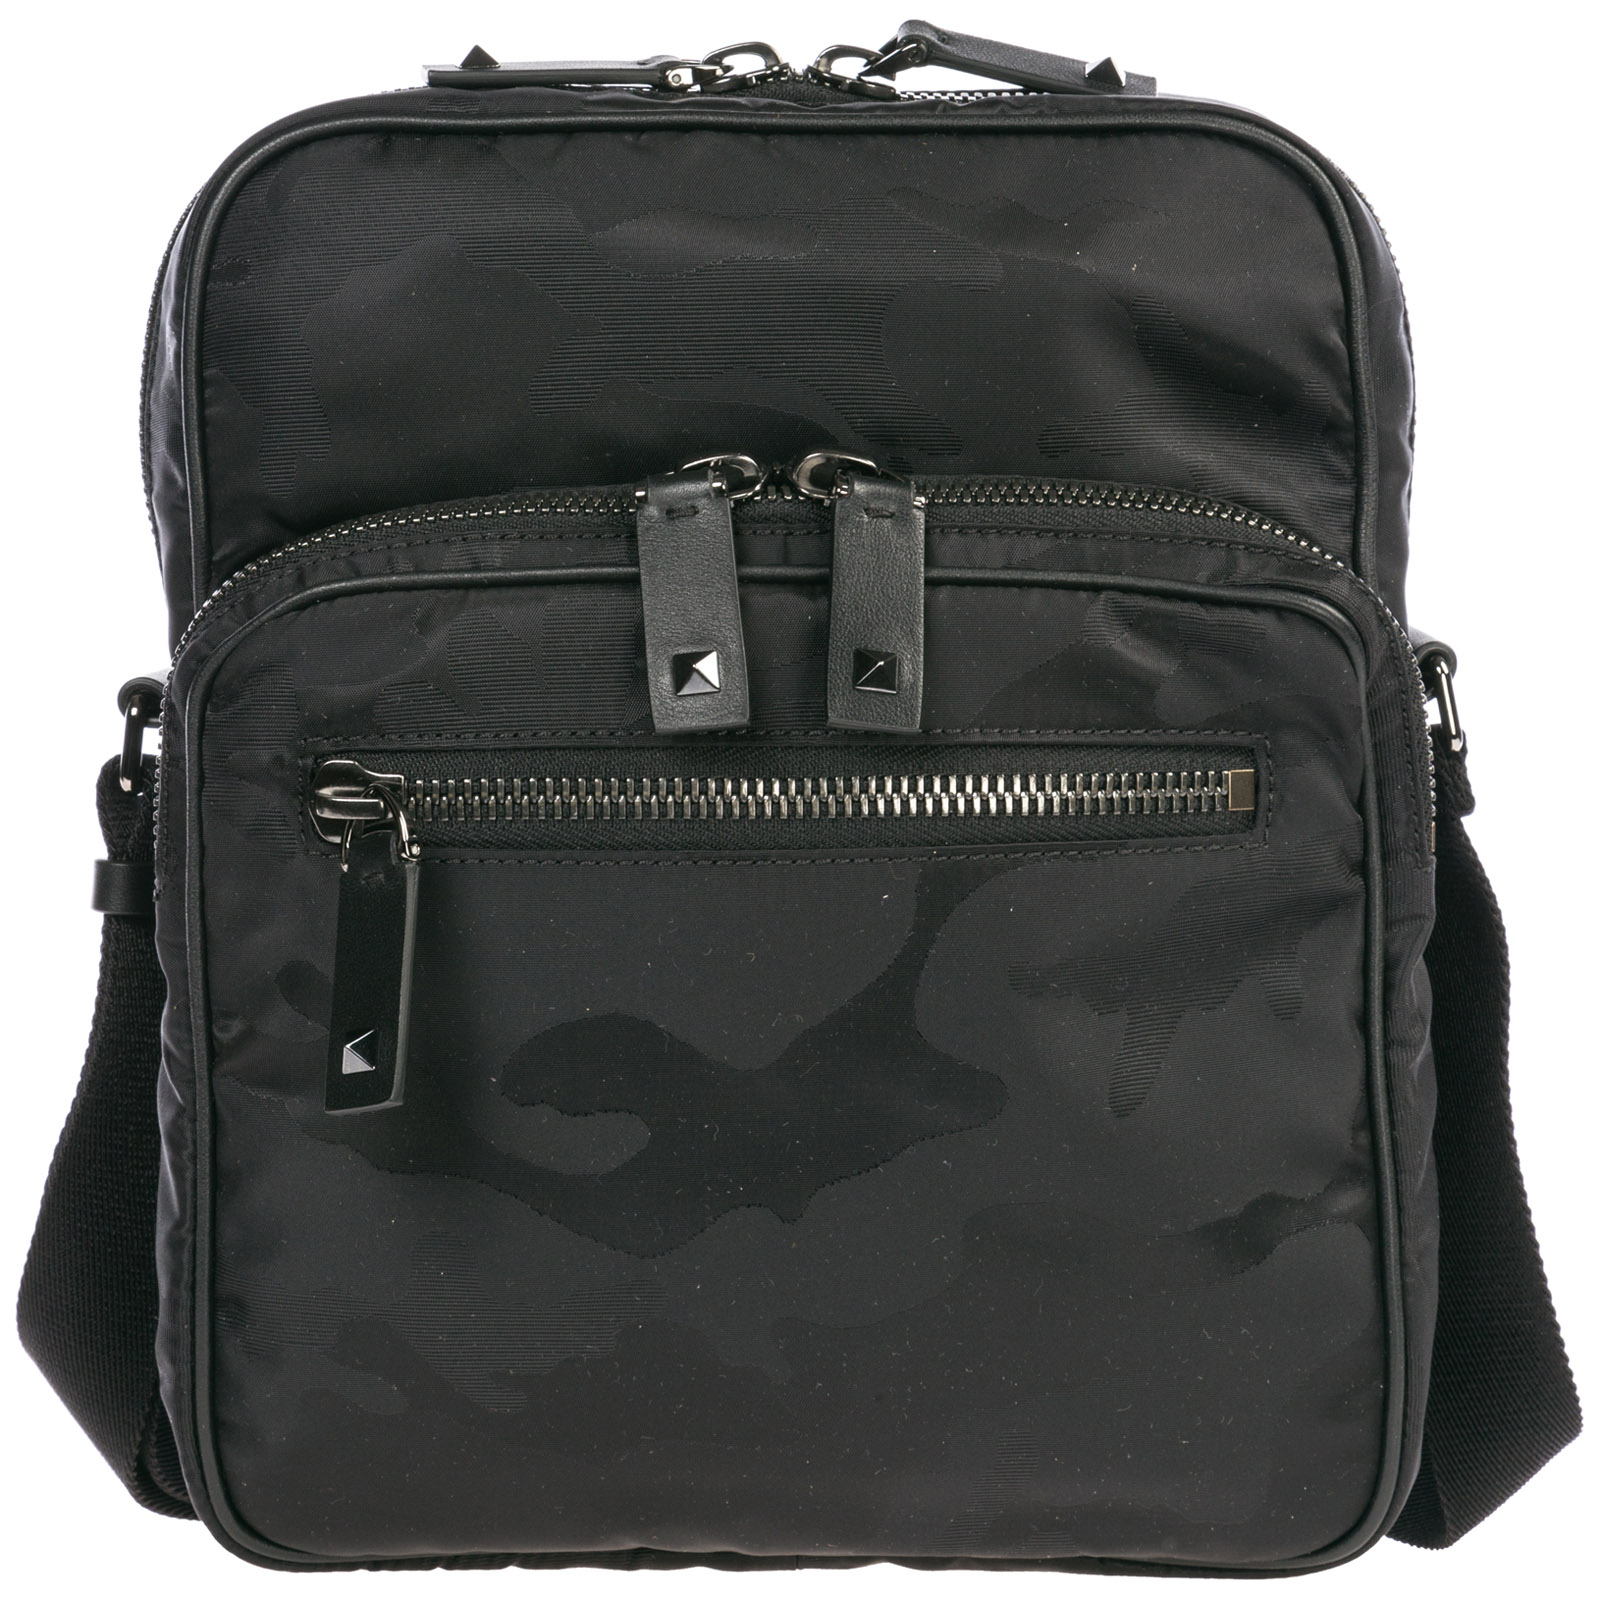 Valentino Garavani Men's Nylon Cross-body Messenger Shoulder Bag In Black